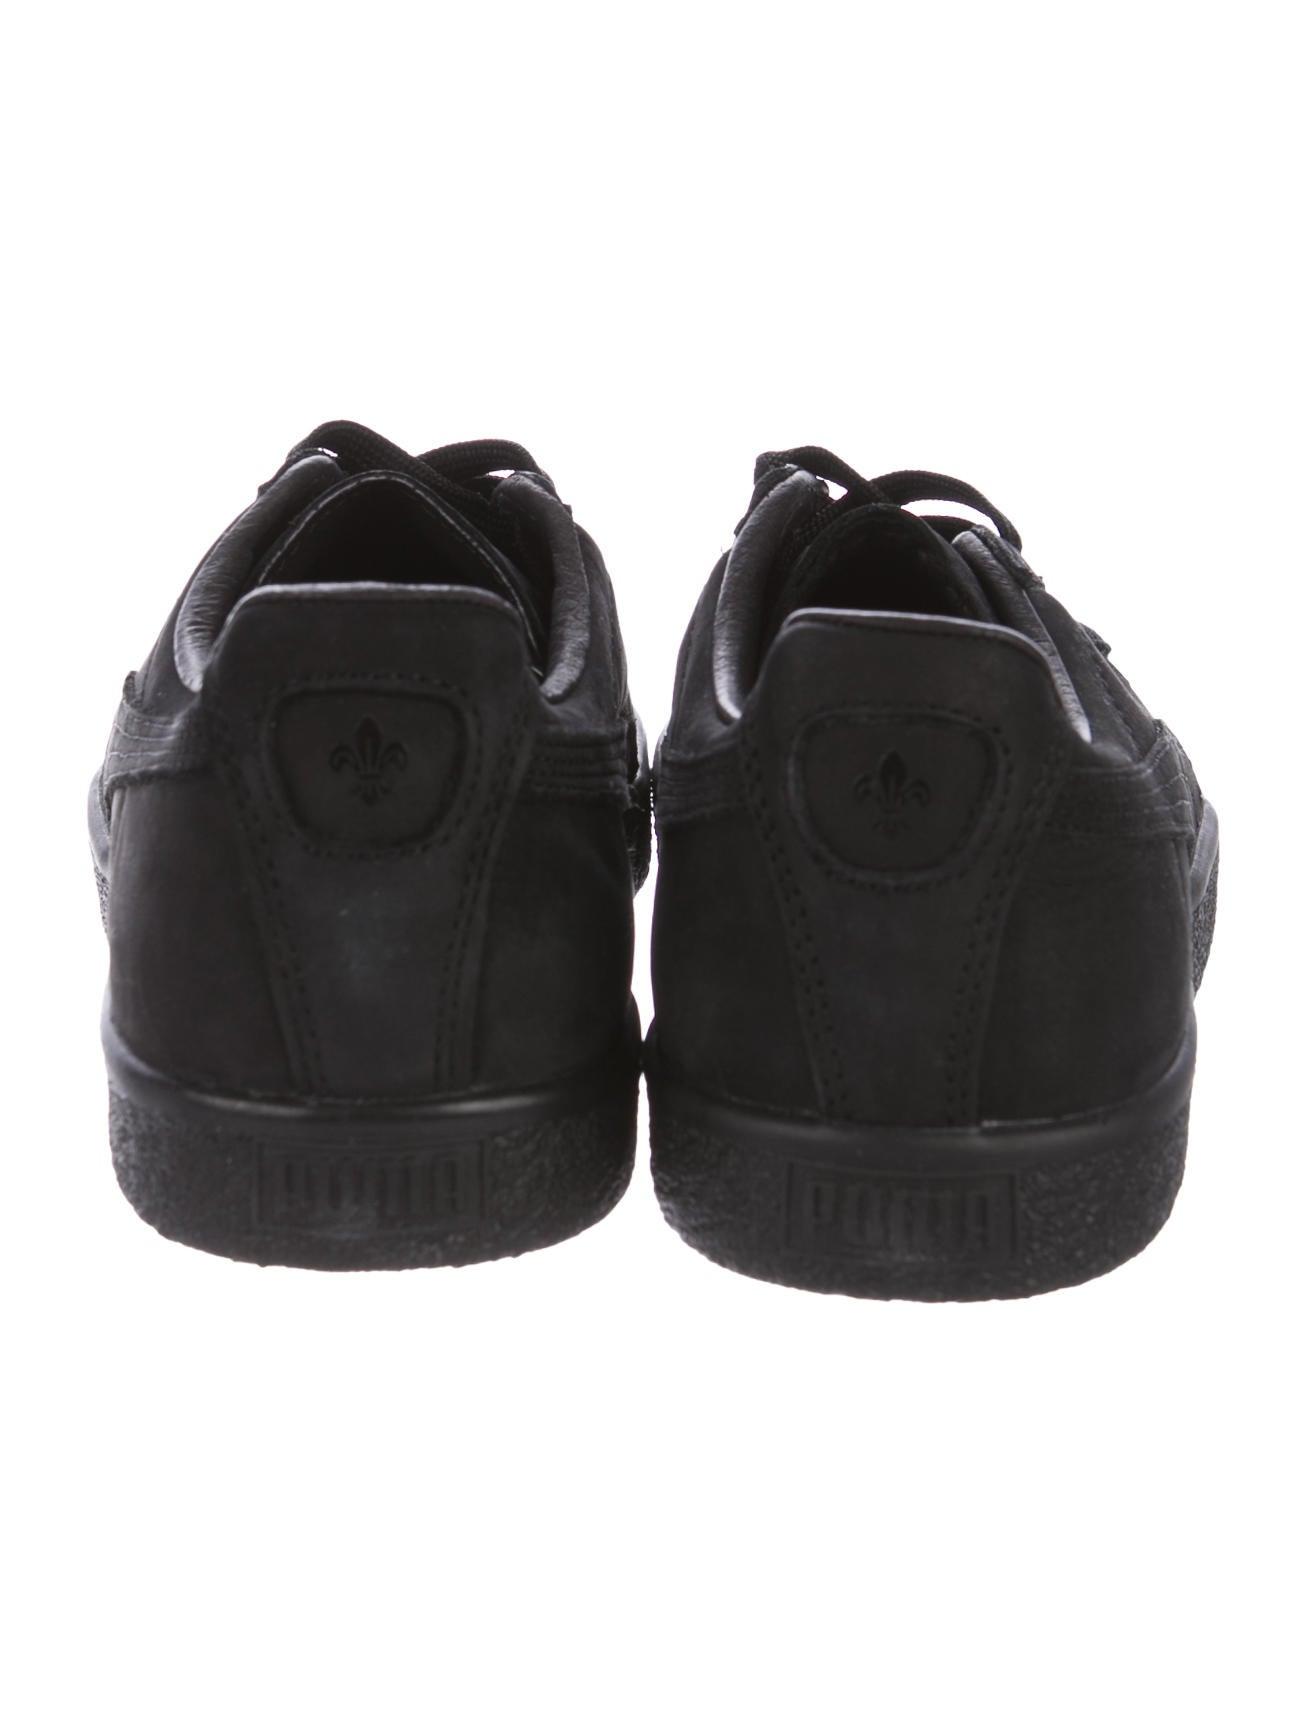 puma x en noir suede clyde low top sneakers shoes wpaen20002 the realreal. Black Bedroom Furniture Sets. Home Design Ideas